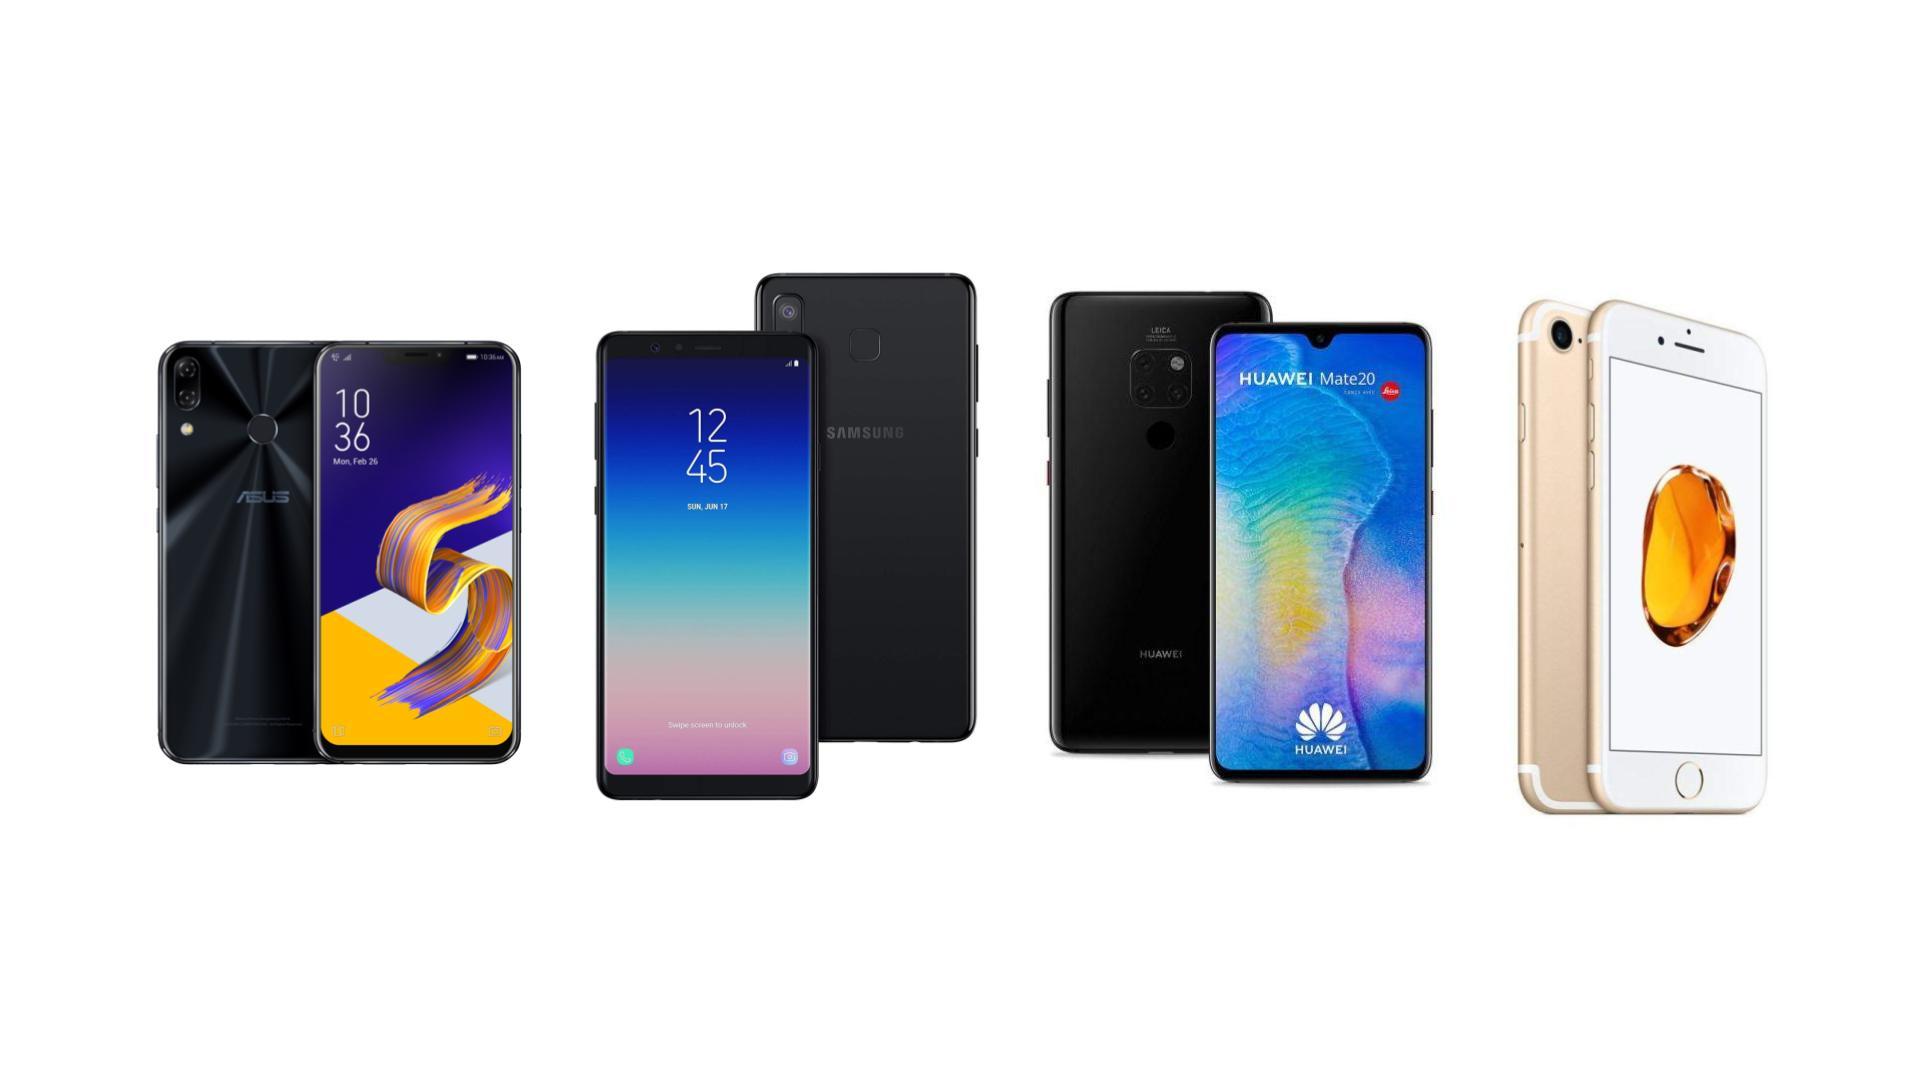 Huawei Mate 20 à 669 euros, iPhone 7 à 320 euros et Zenfone 5 à 269 euros sur eBay